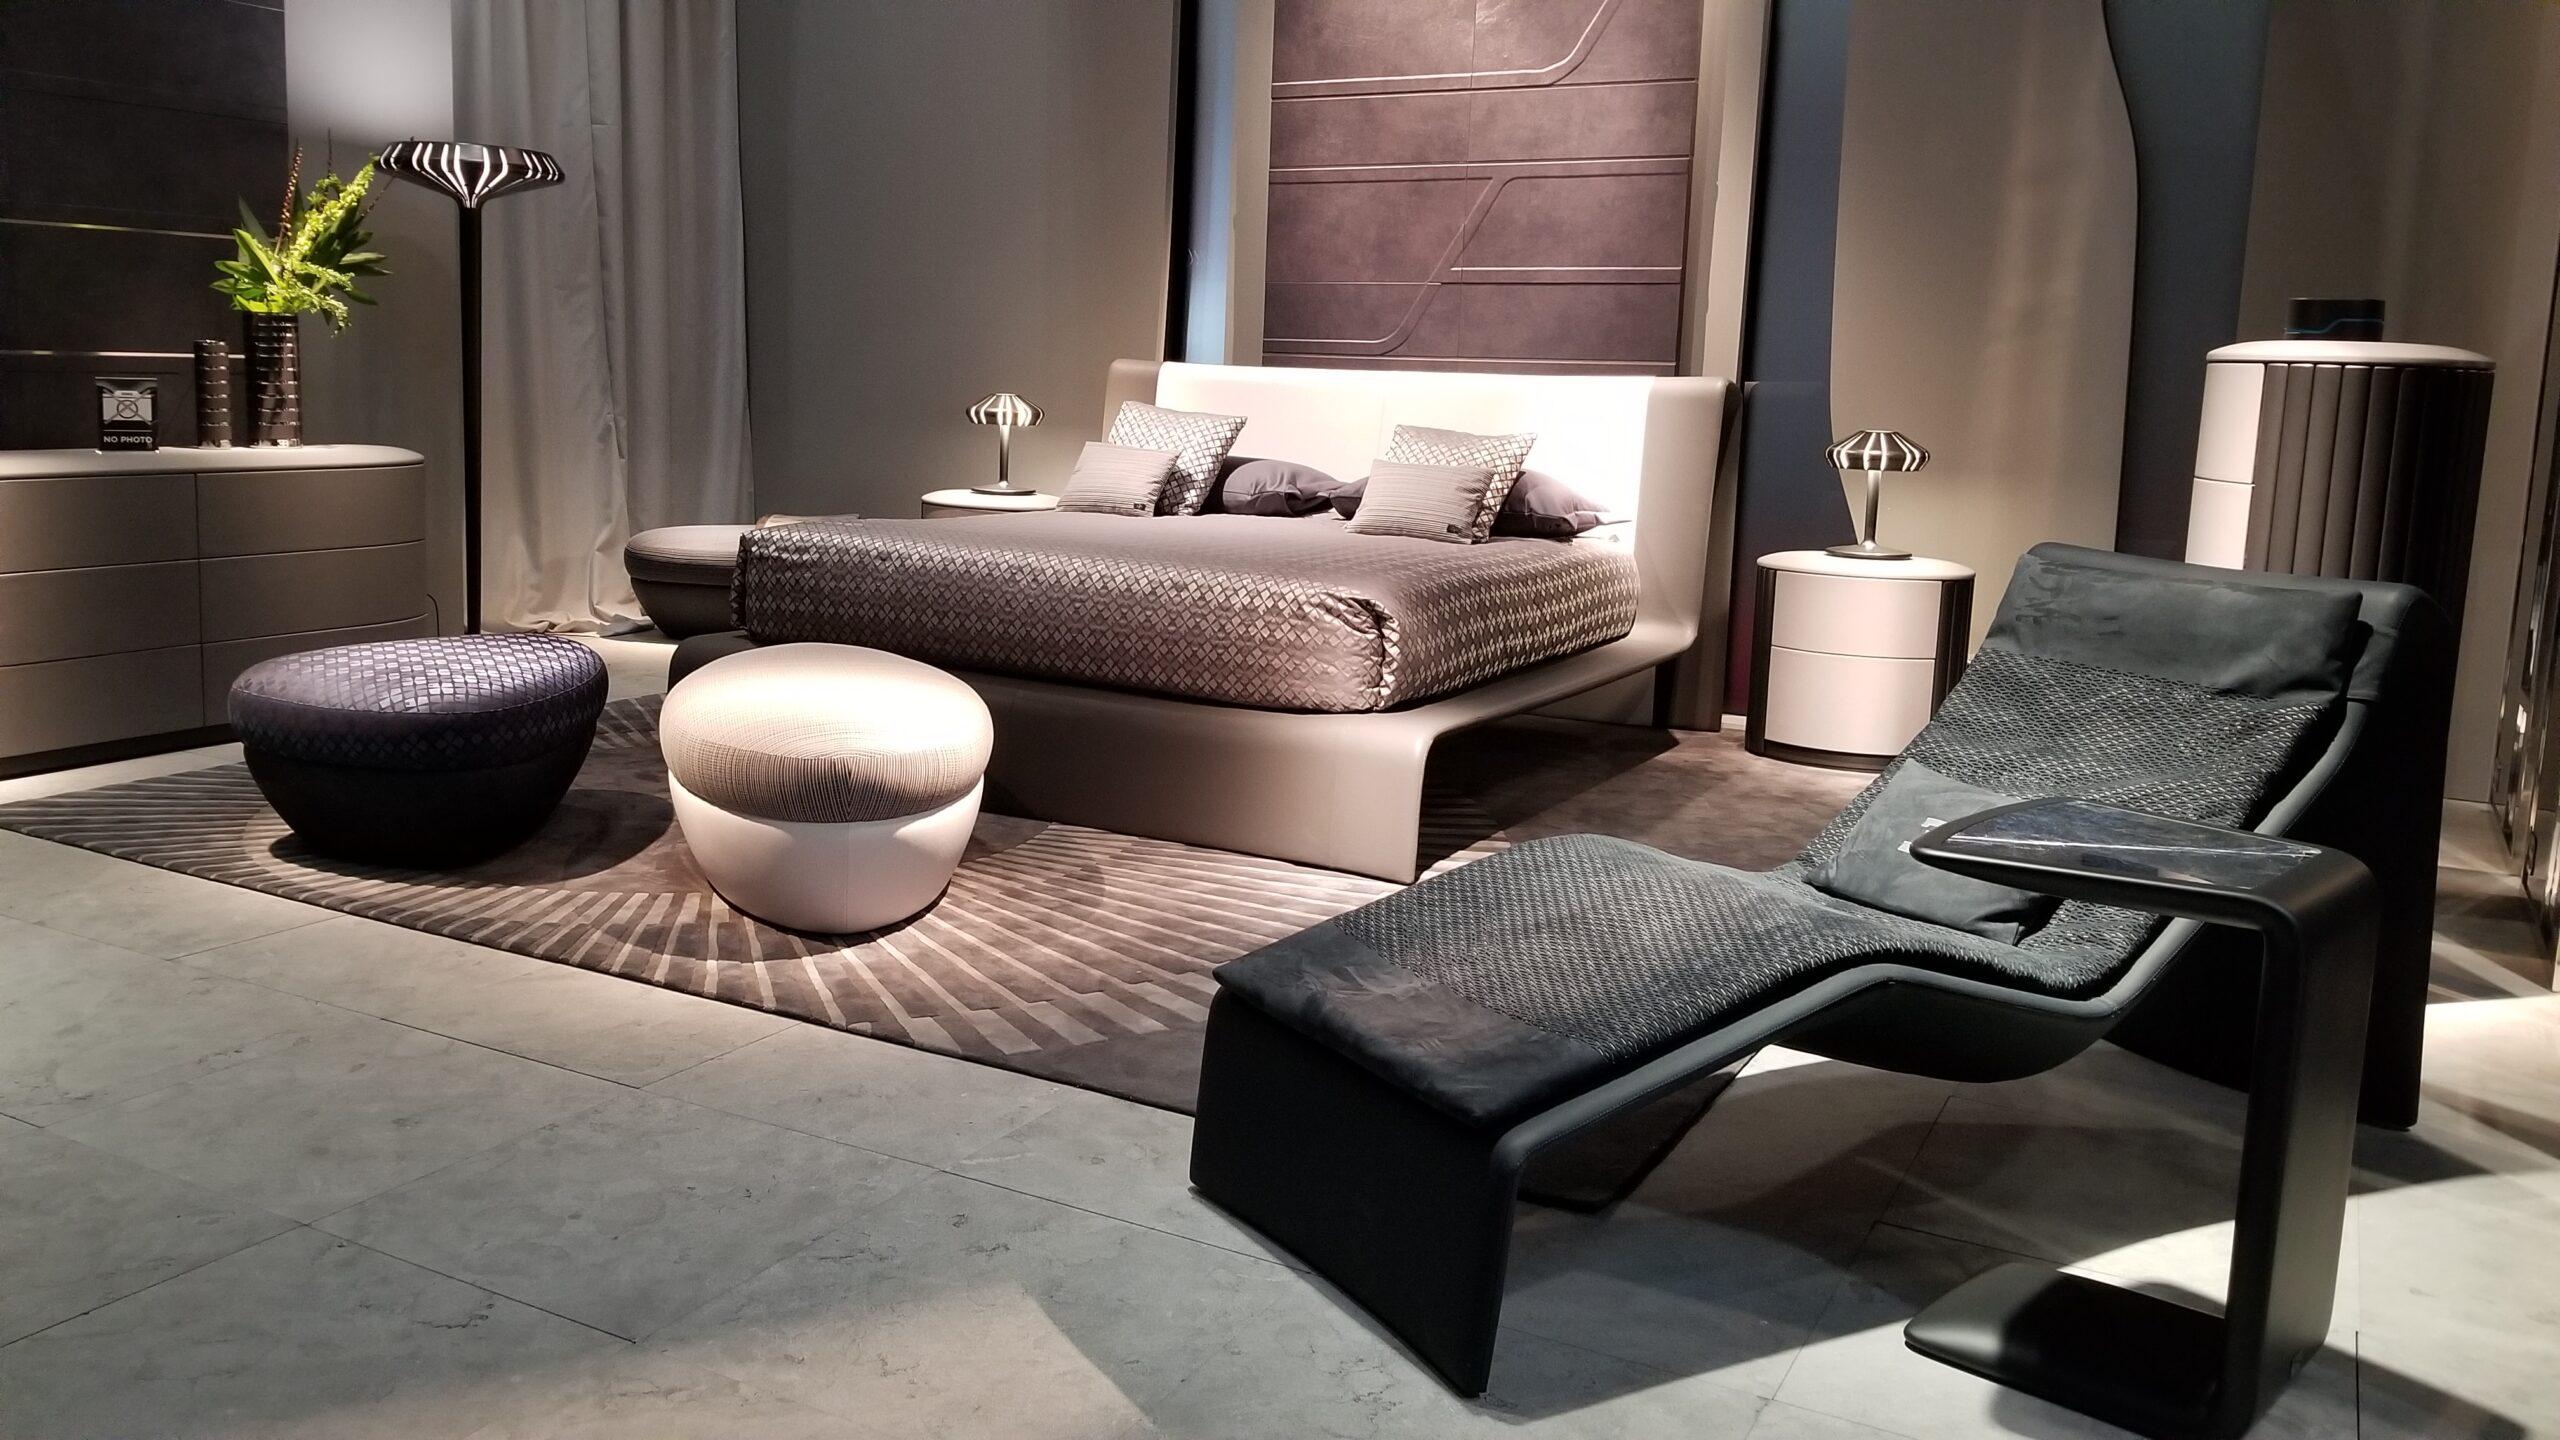 bugatti, major interiors, salon del mobile milano, helen siwak, made in italy, ecoluxluv, folioyvr